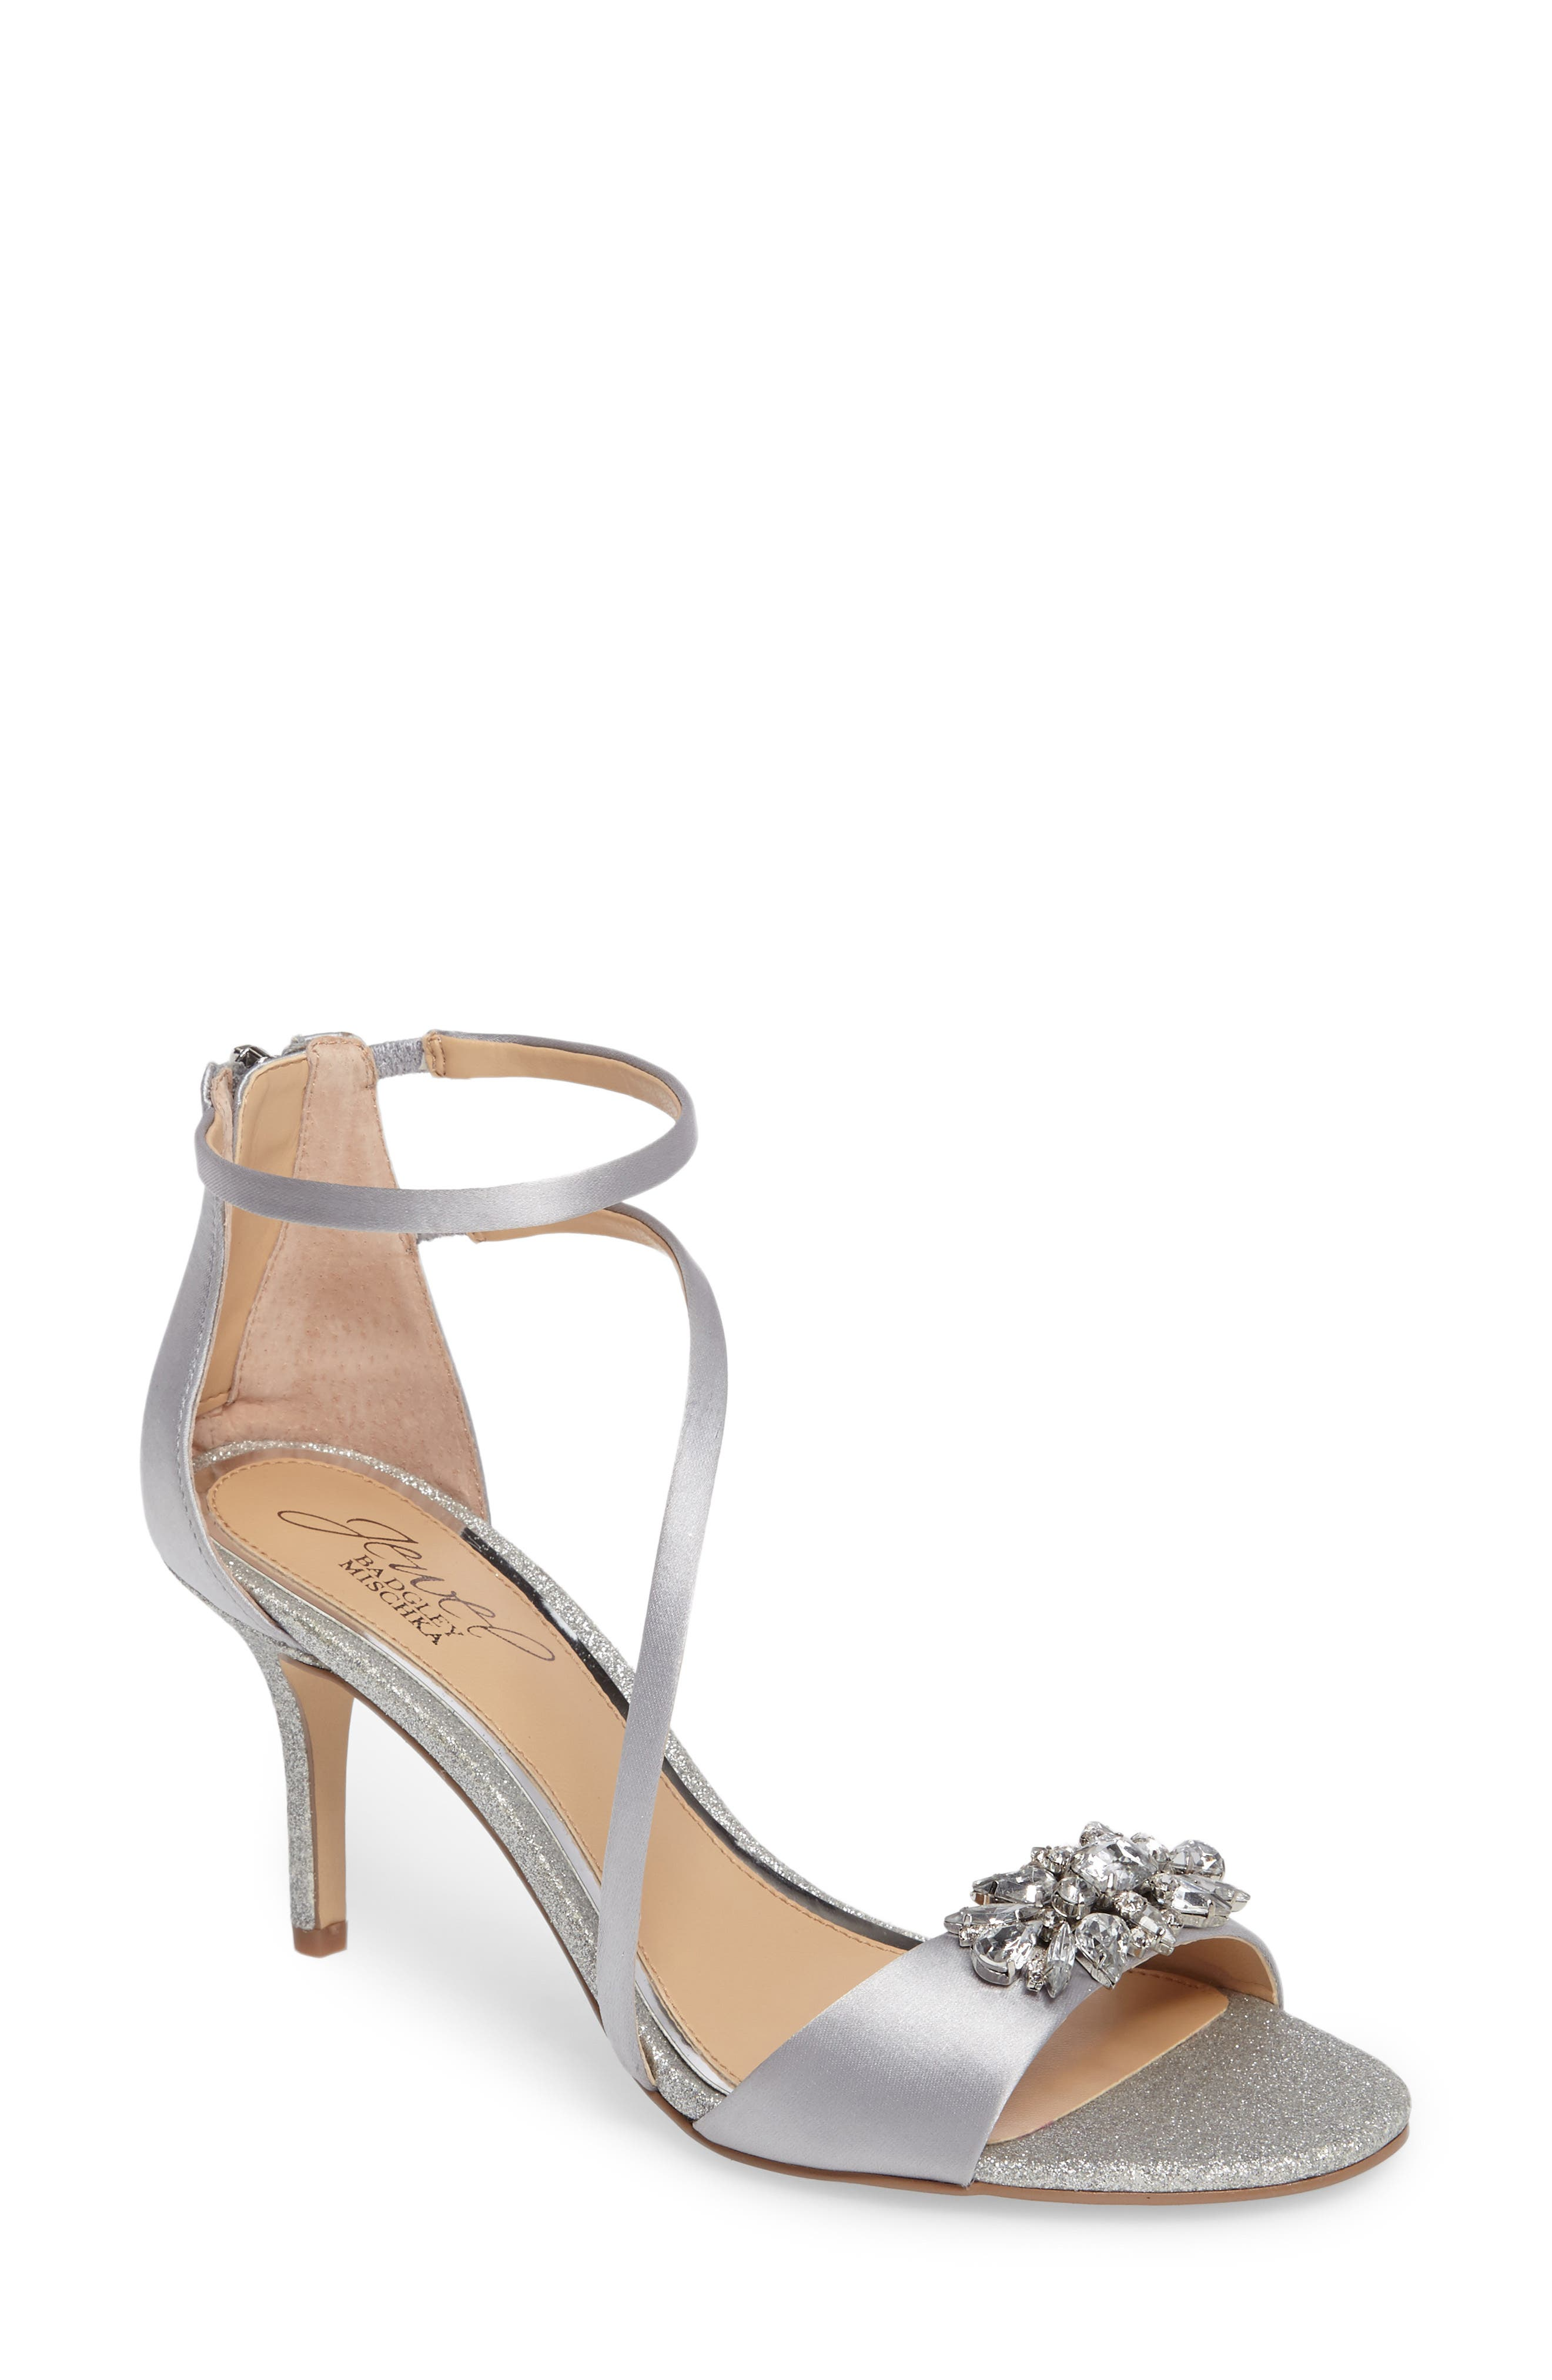 Main Image - Jewel Badgley Mischka Leighton Embellished Strappy Sandal (Women)